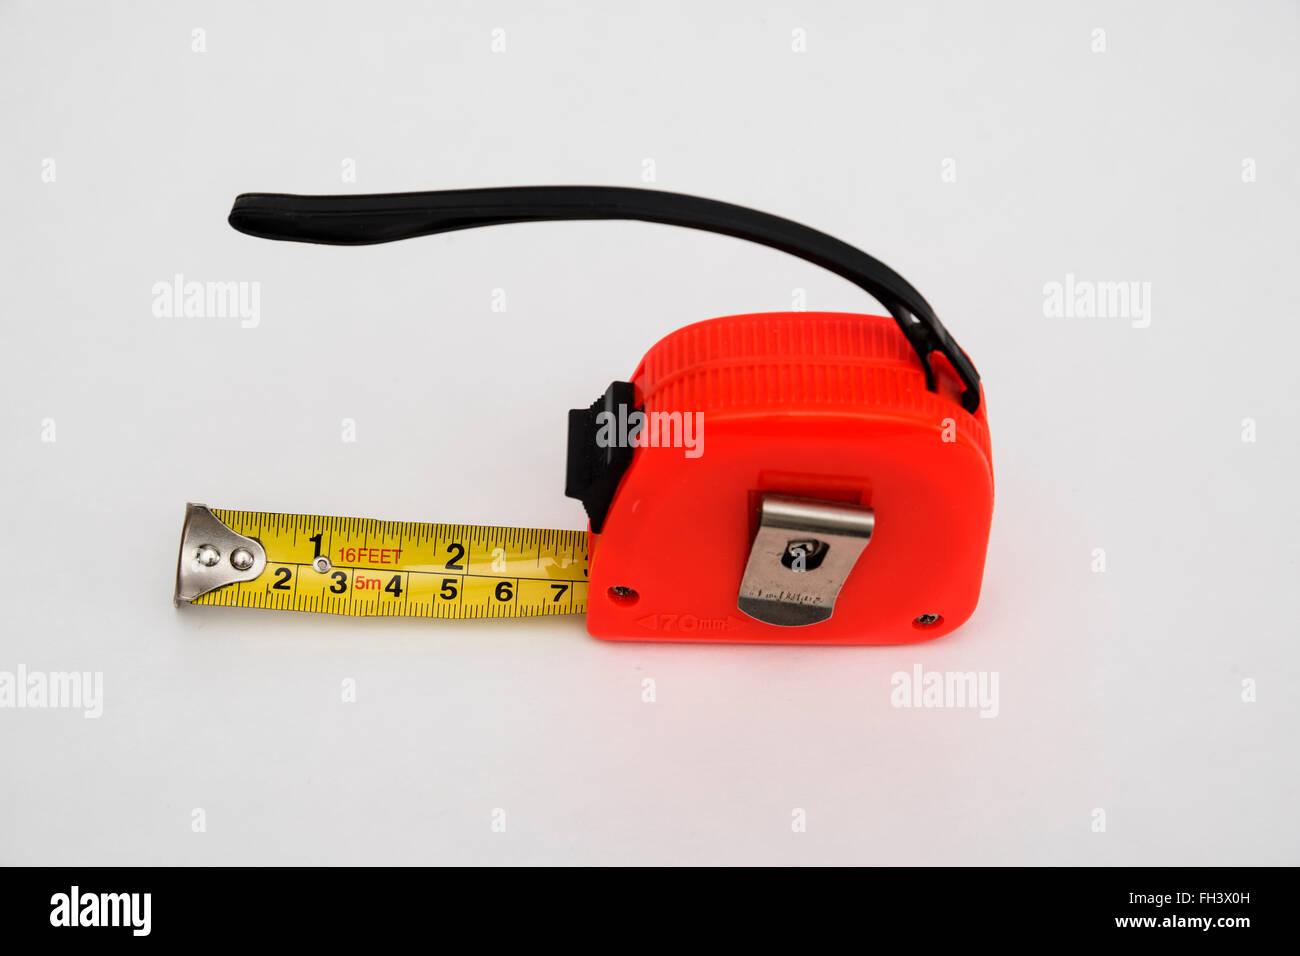 yardstick tool - Stock Image